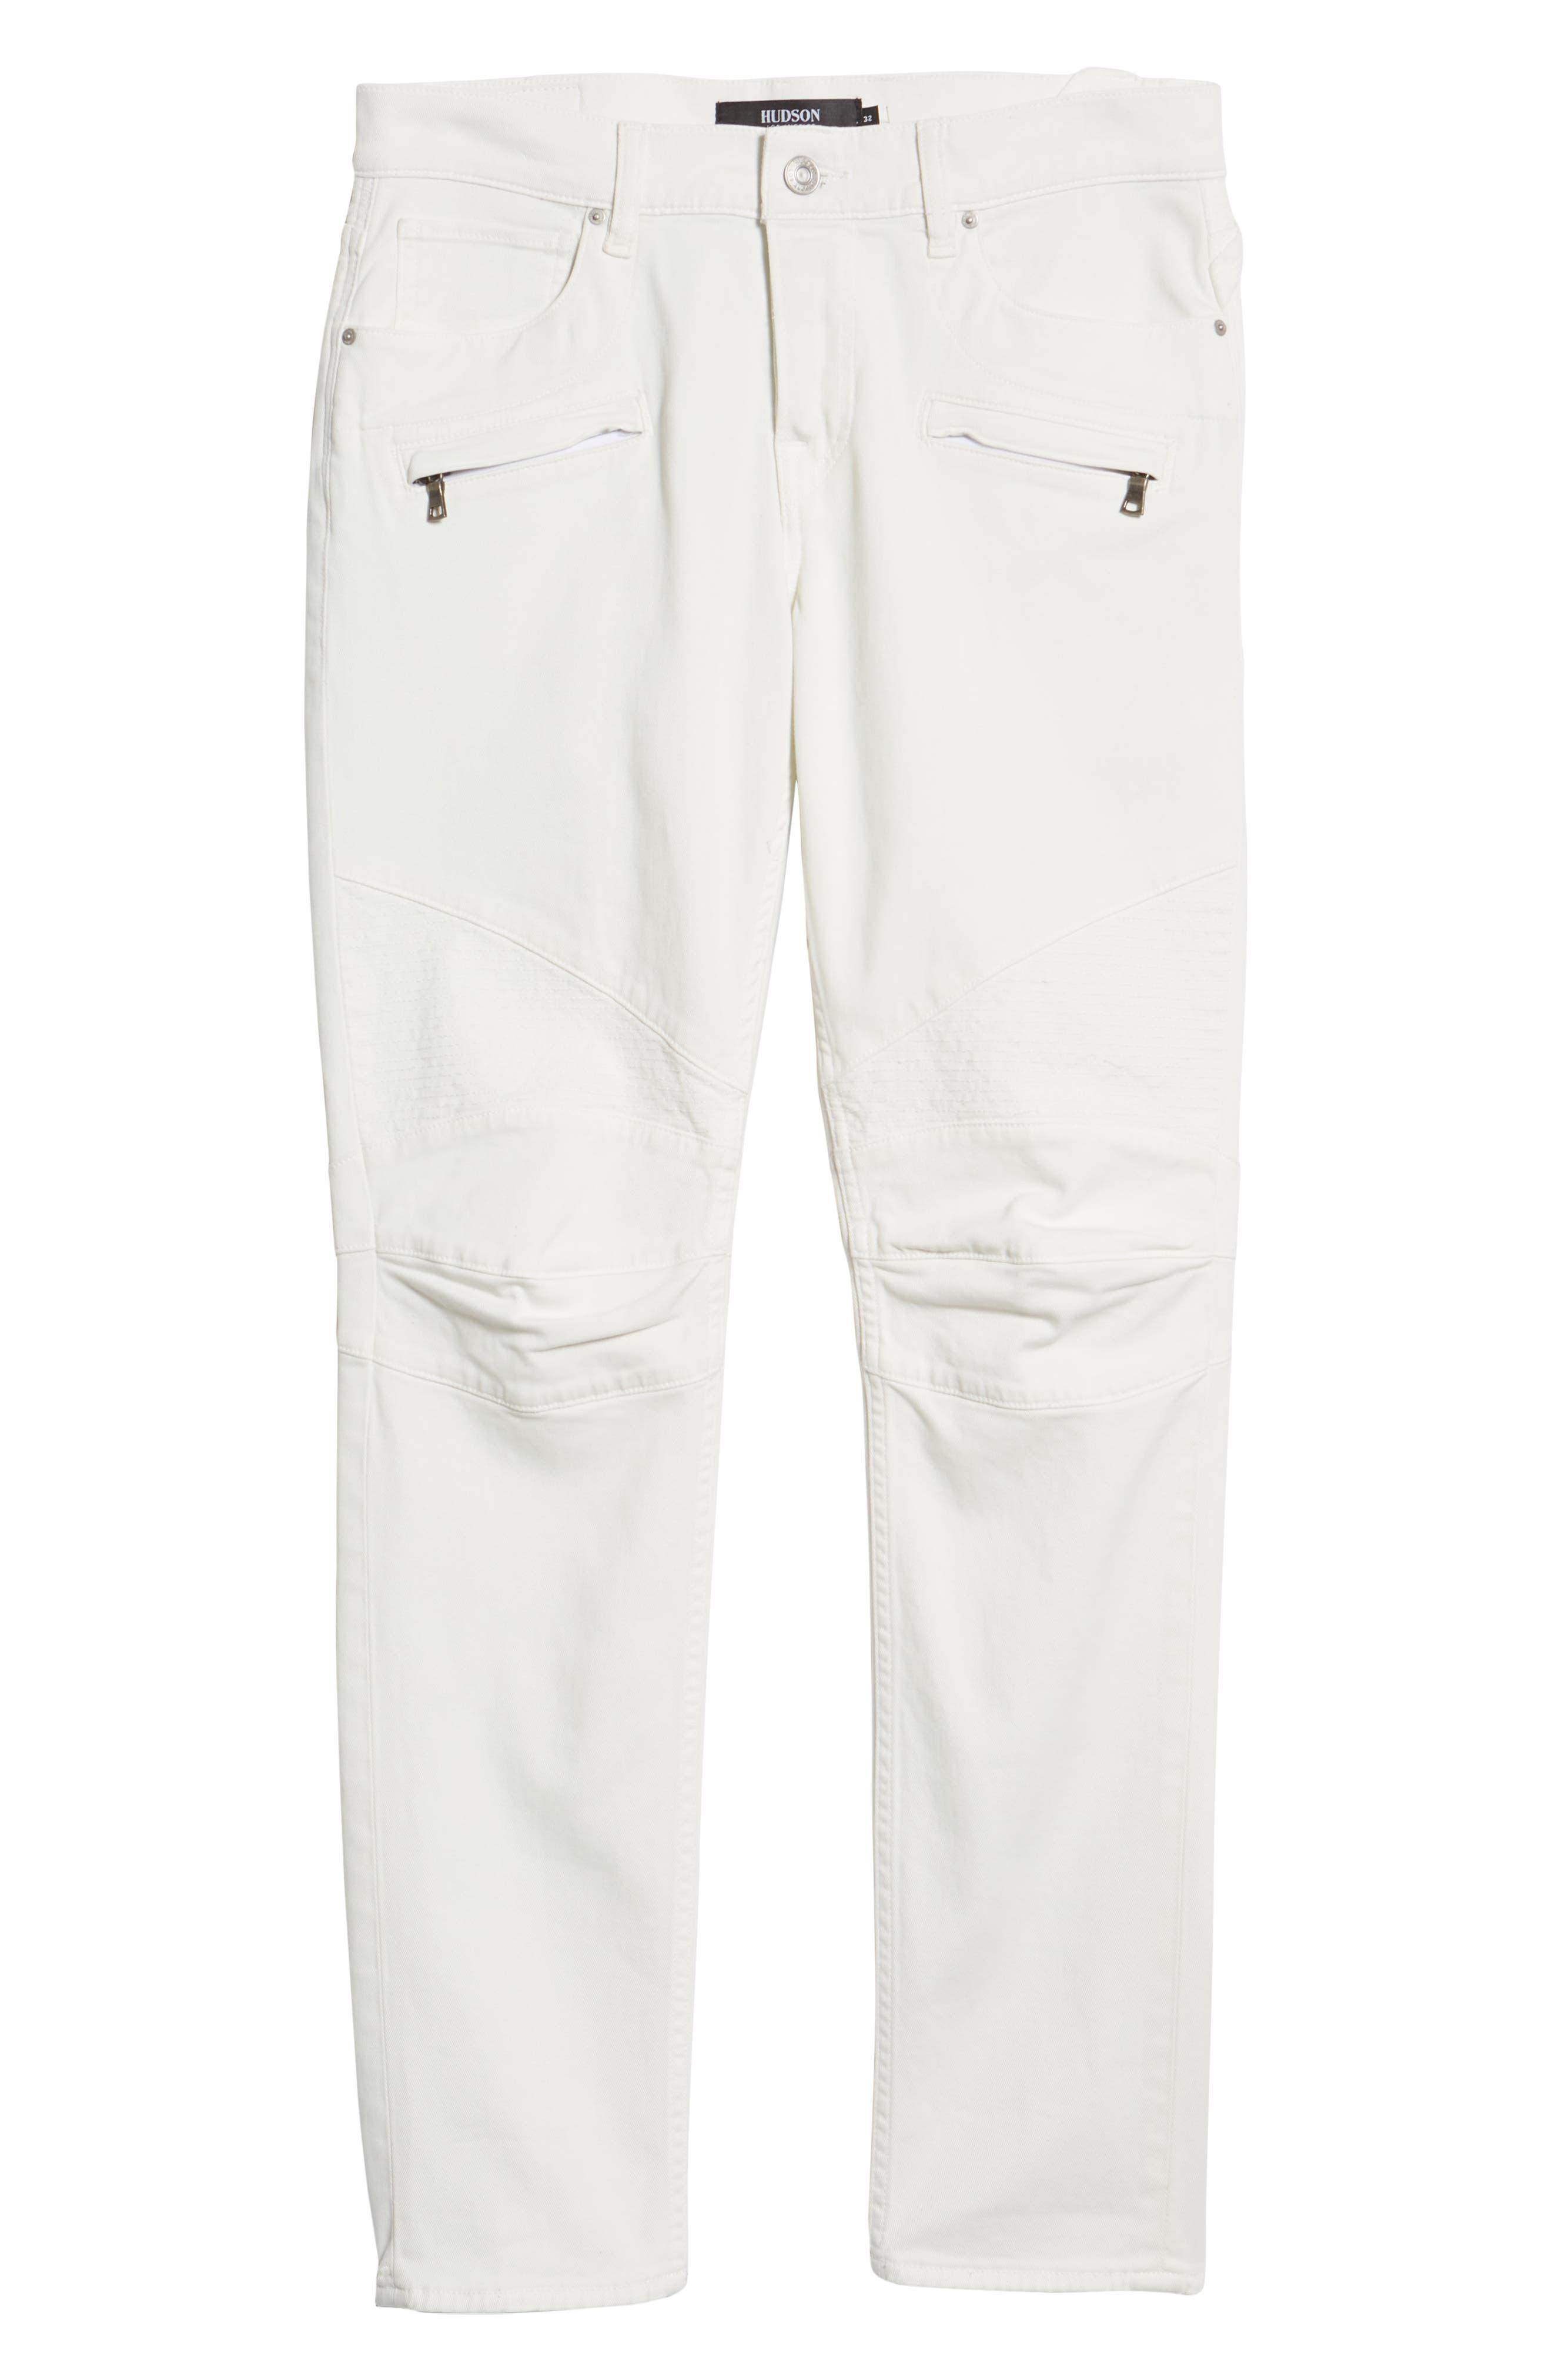 Blinder Biker Skinny Fit Jeans,                             Alternate thumbnail 6, color,                             DIRTY WHITE